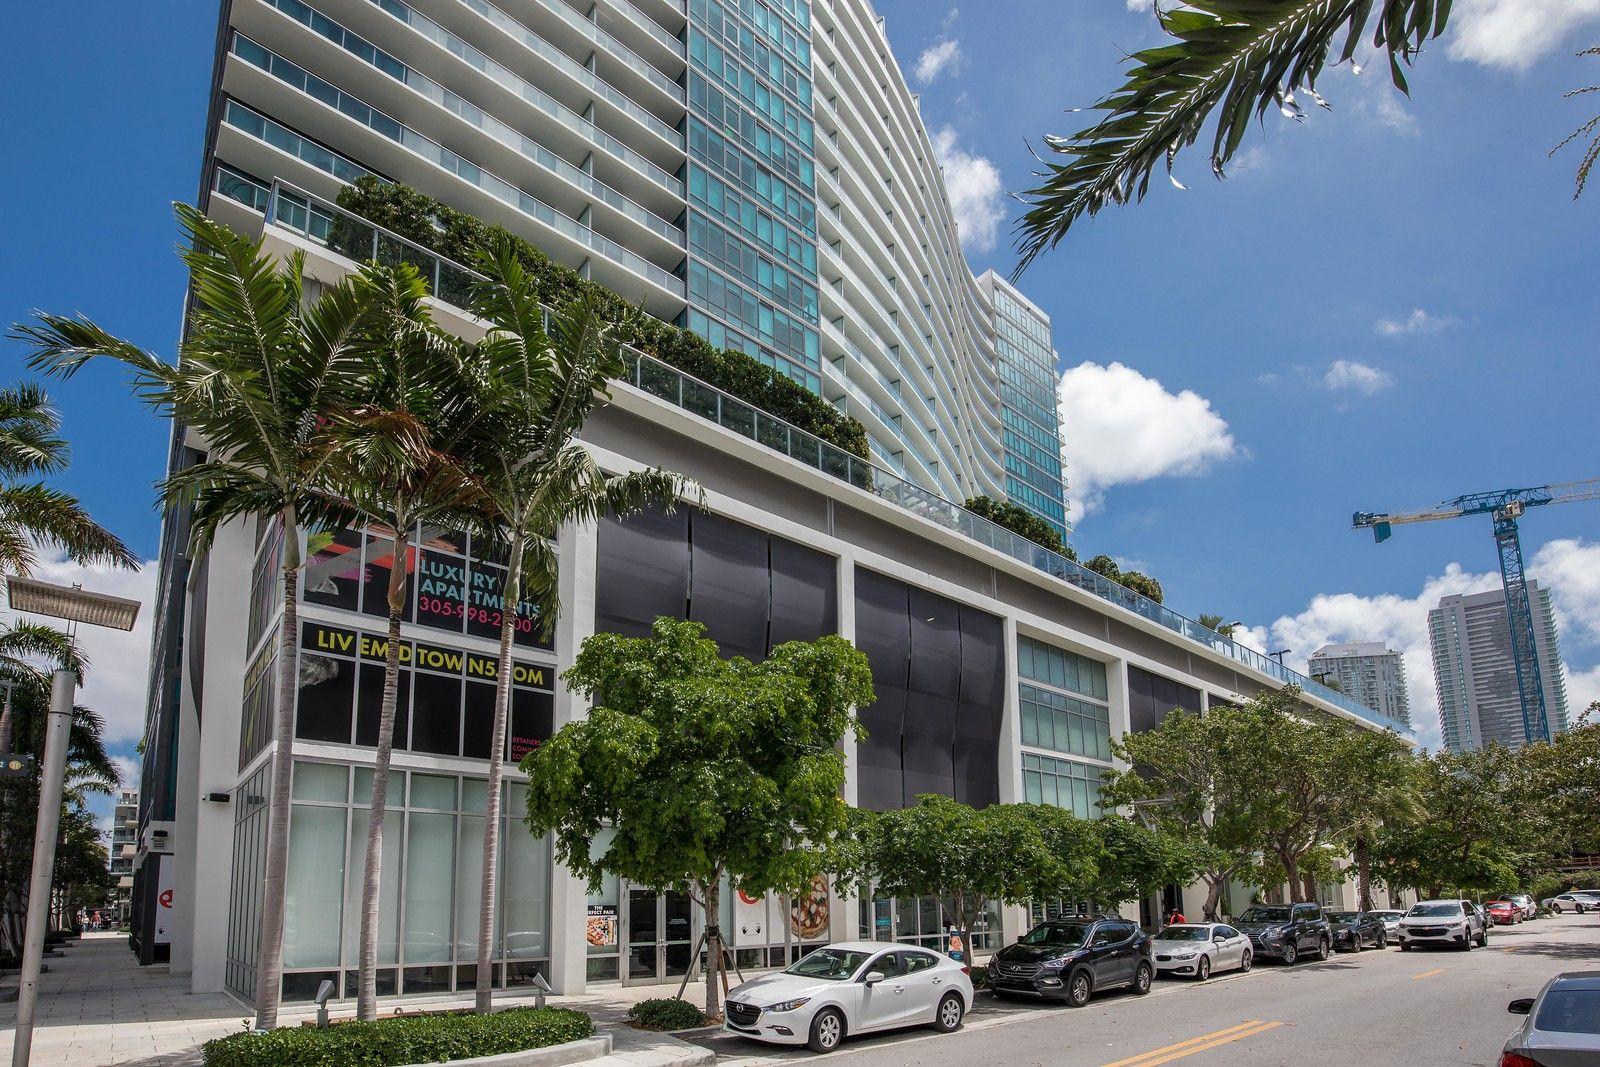 Miami Midtown 5 Tower Midtown Luxury Apartments Building Facade